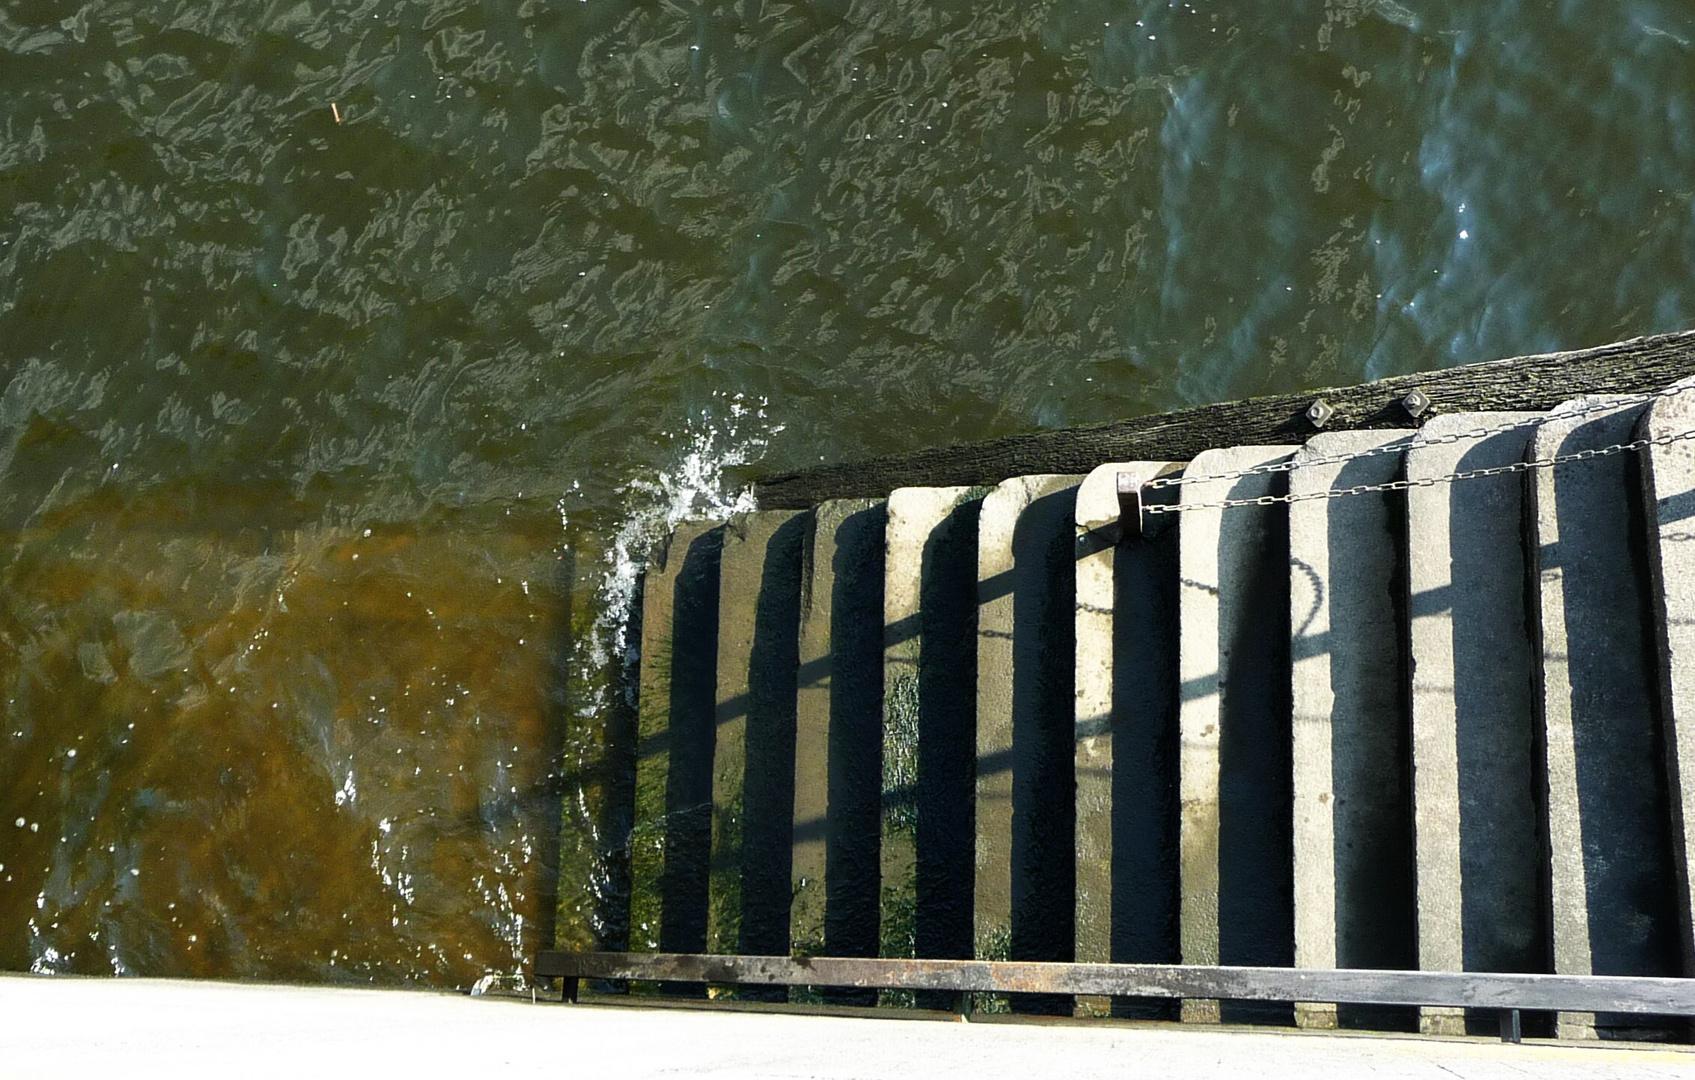 Treppe zu Neptun?